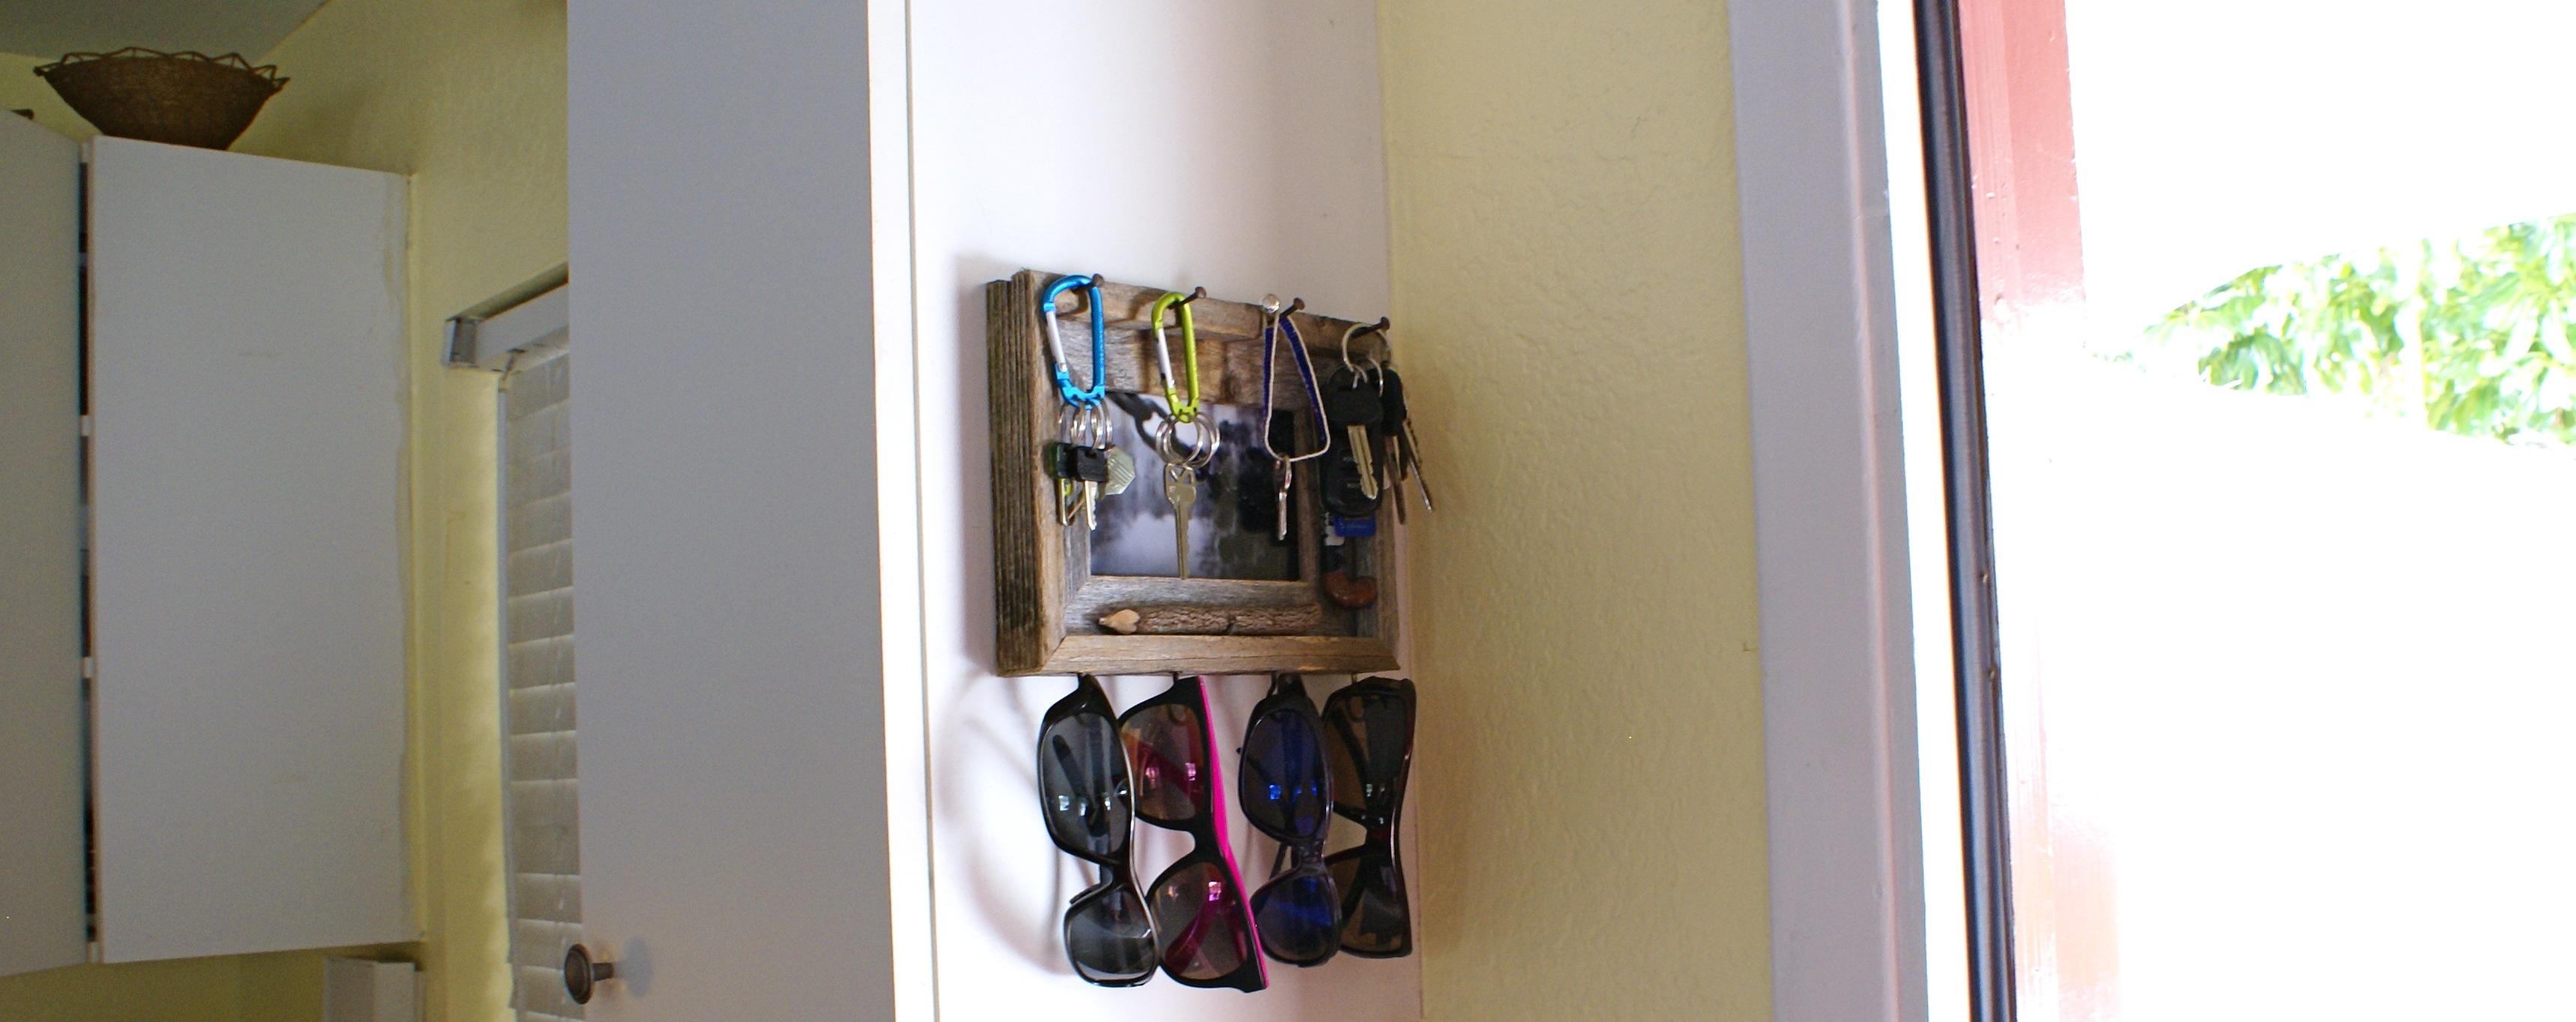 Rustic Key & Sunglasses Holder - Grab n' Go! - via The Thinking Closet